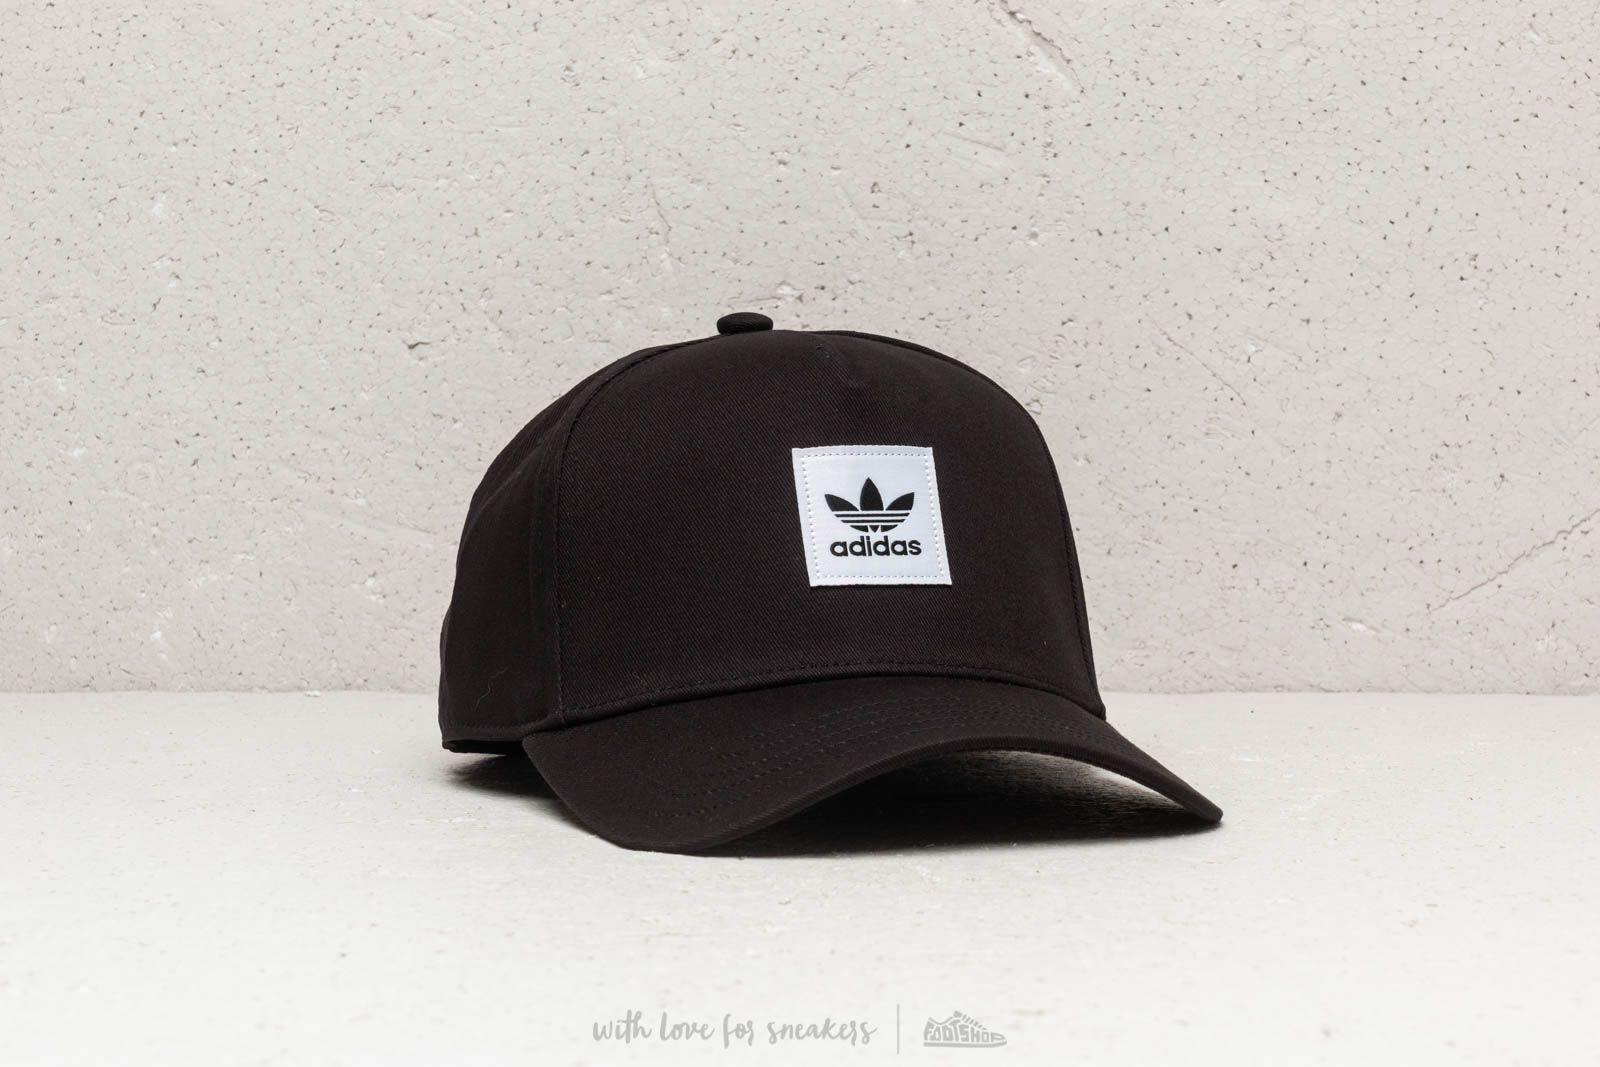 adidas A-frame Cap Black  White a muy buen precio 22 € comprar en fa88f072693